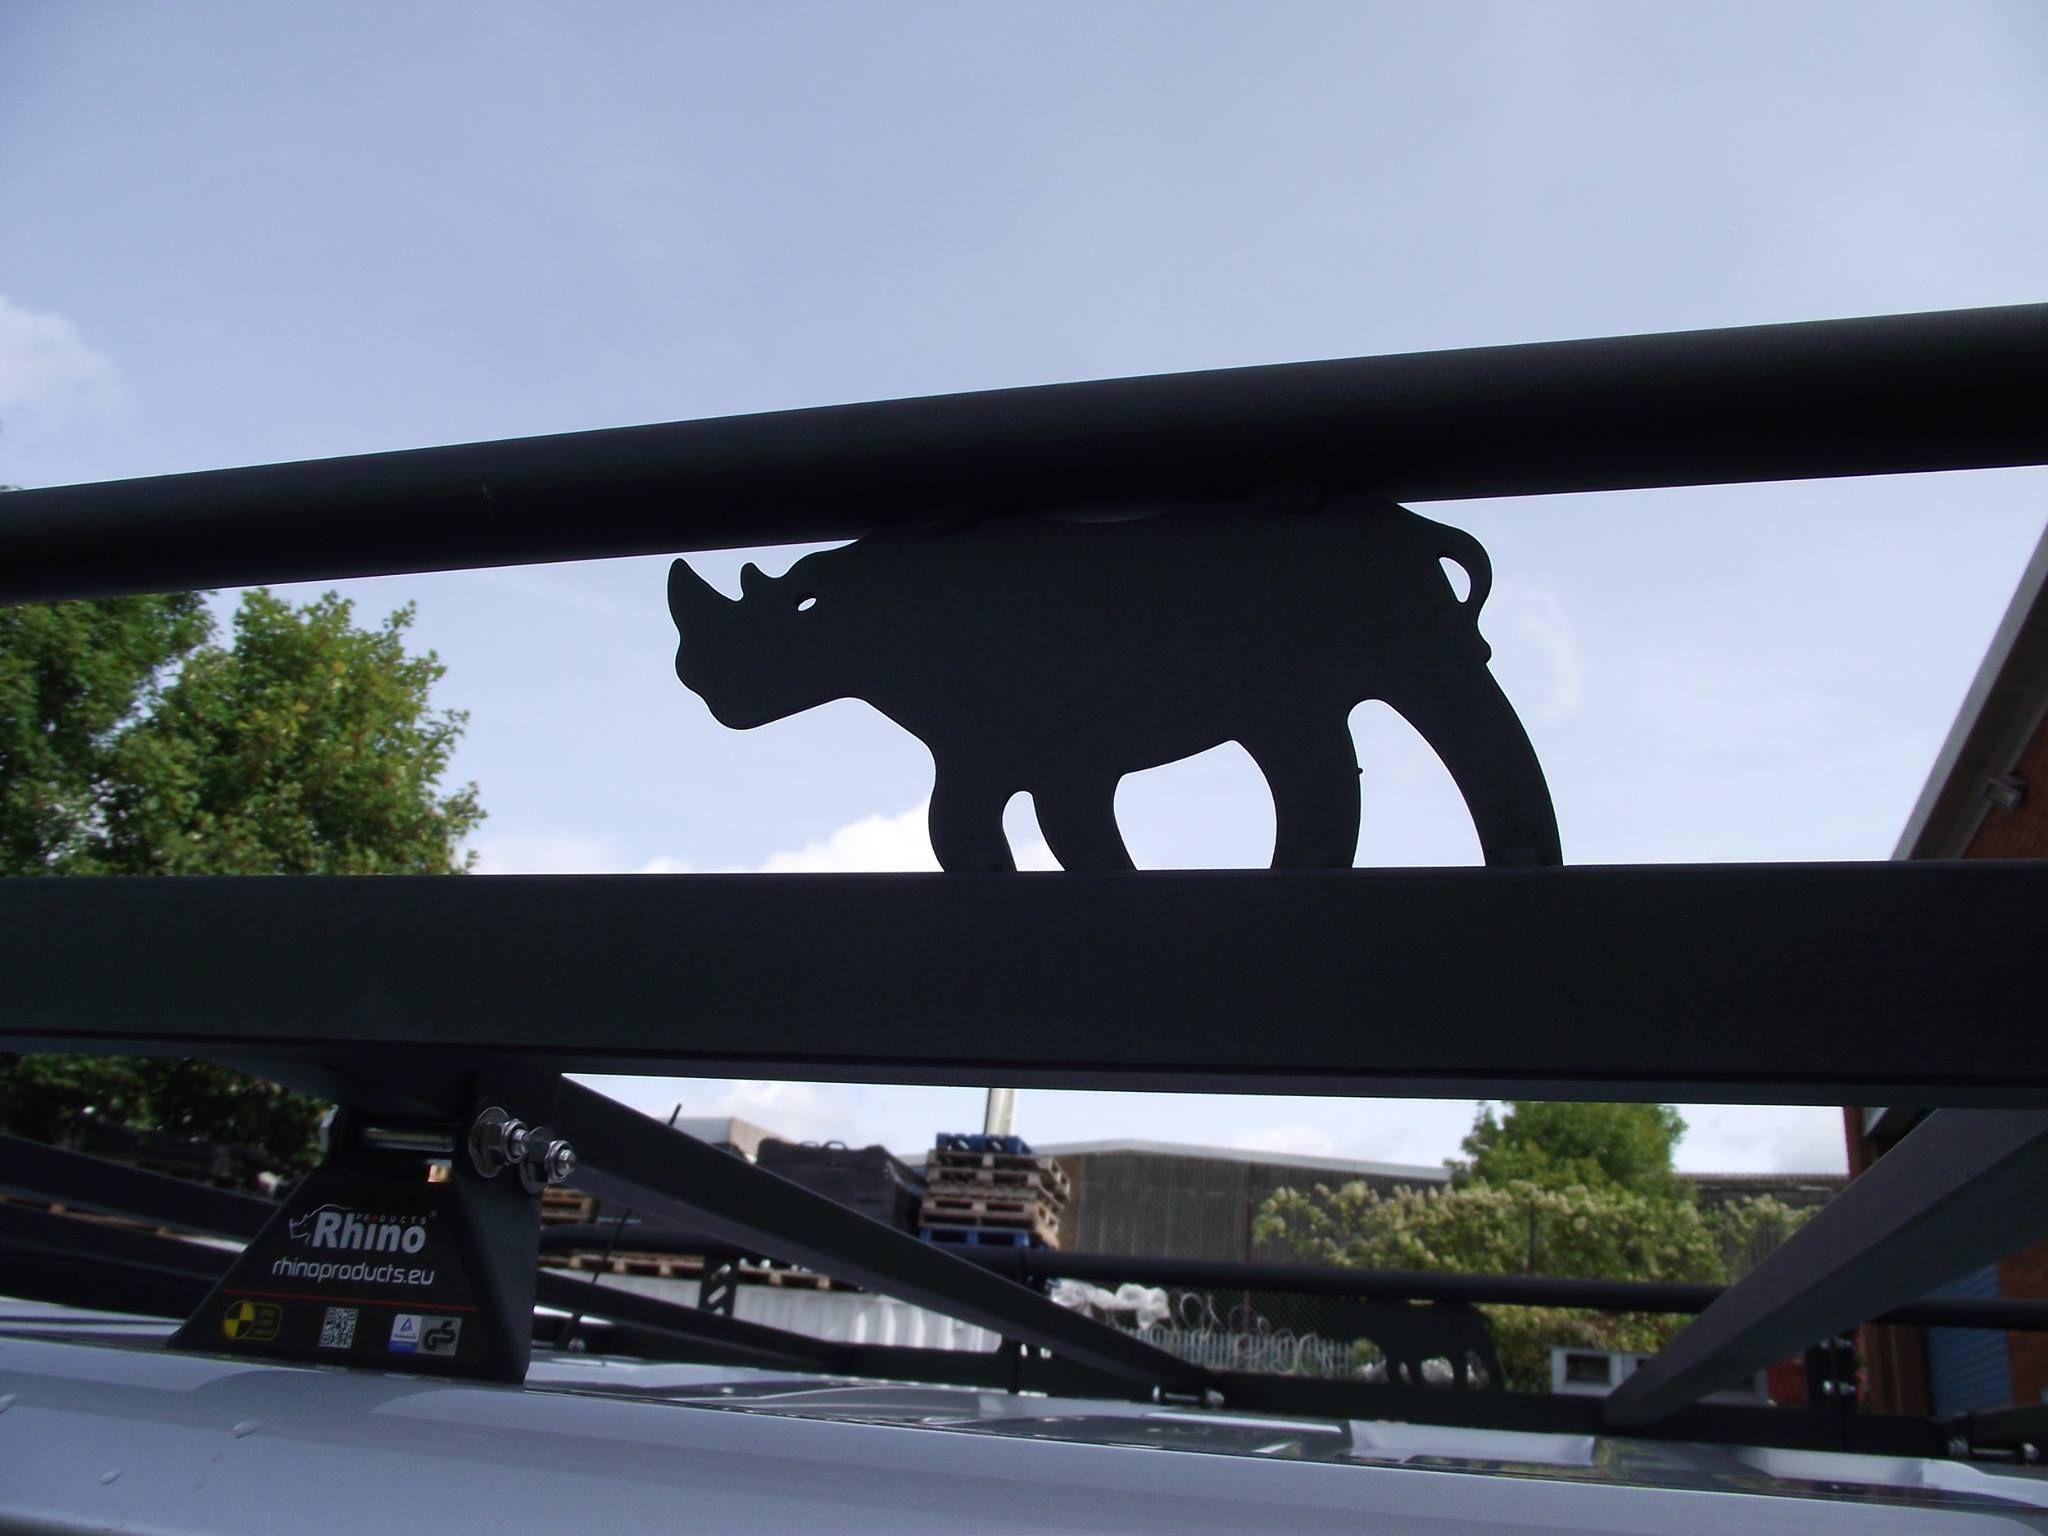 builderroof flat racks nebo rails reviewsnebo teraflex of size roller roof reviews etrailer jeep kayak rackroof full rack for cross rhino pictures review